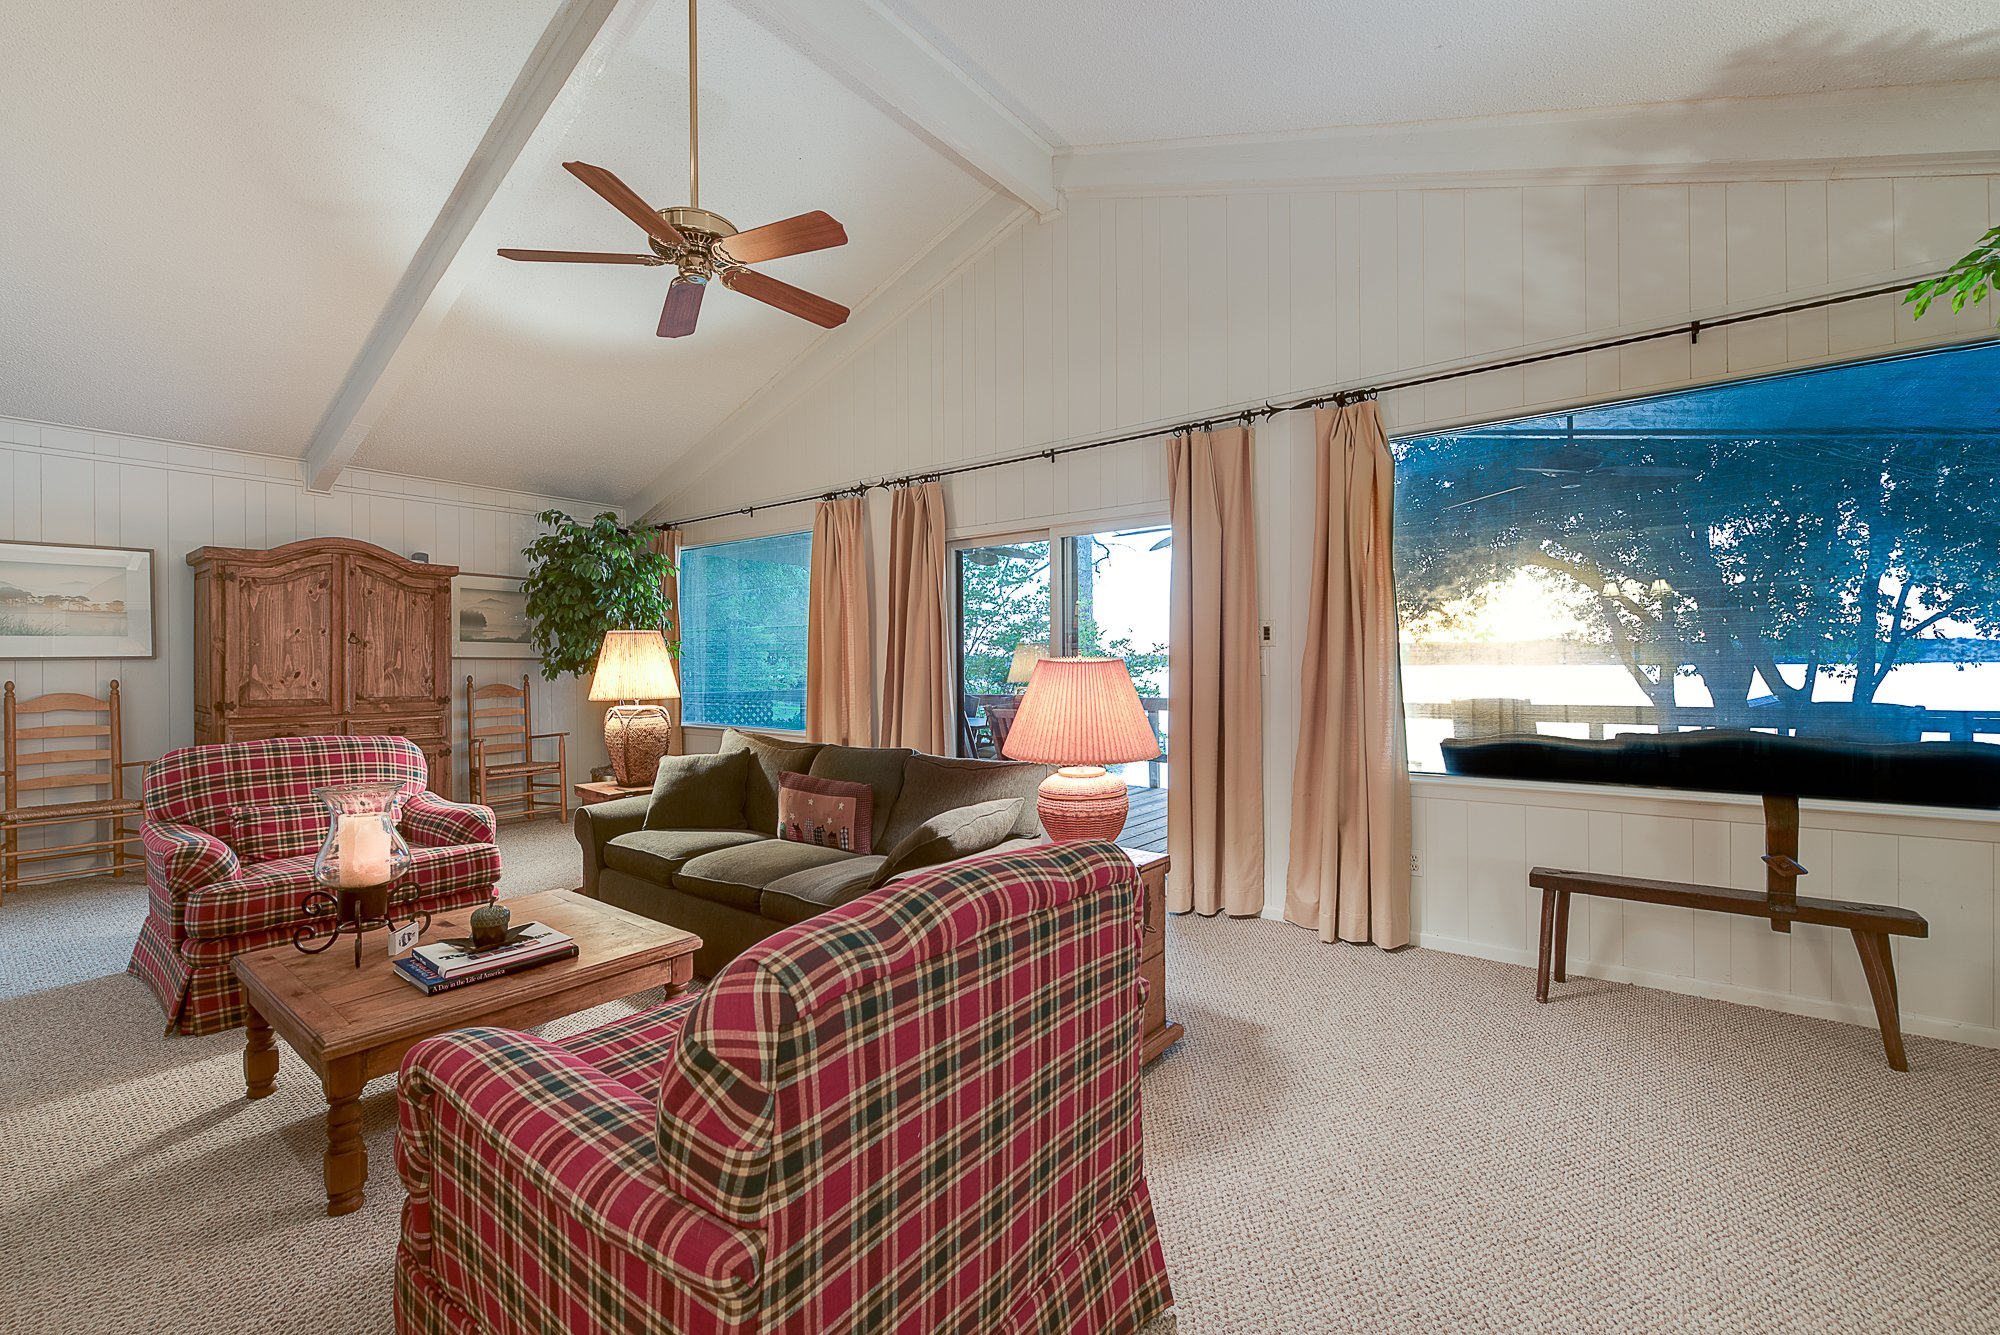 Fresh Listing Friday: Convenient Lakeside Retreat